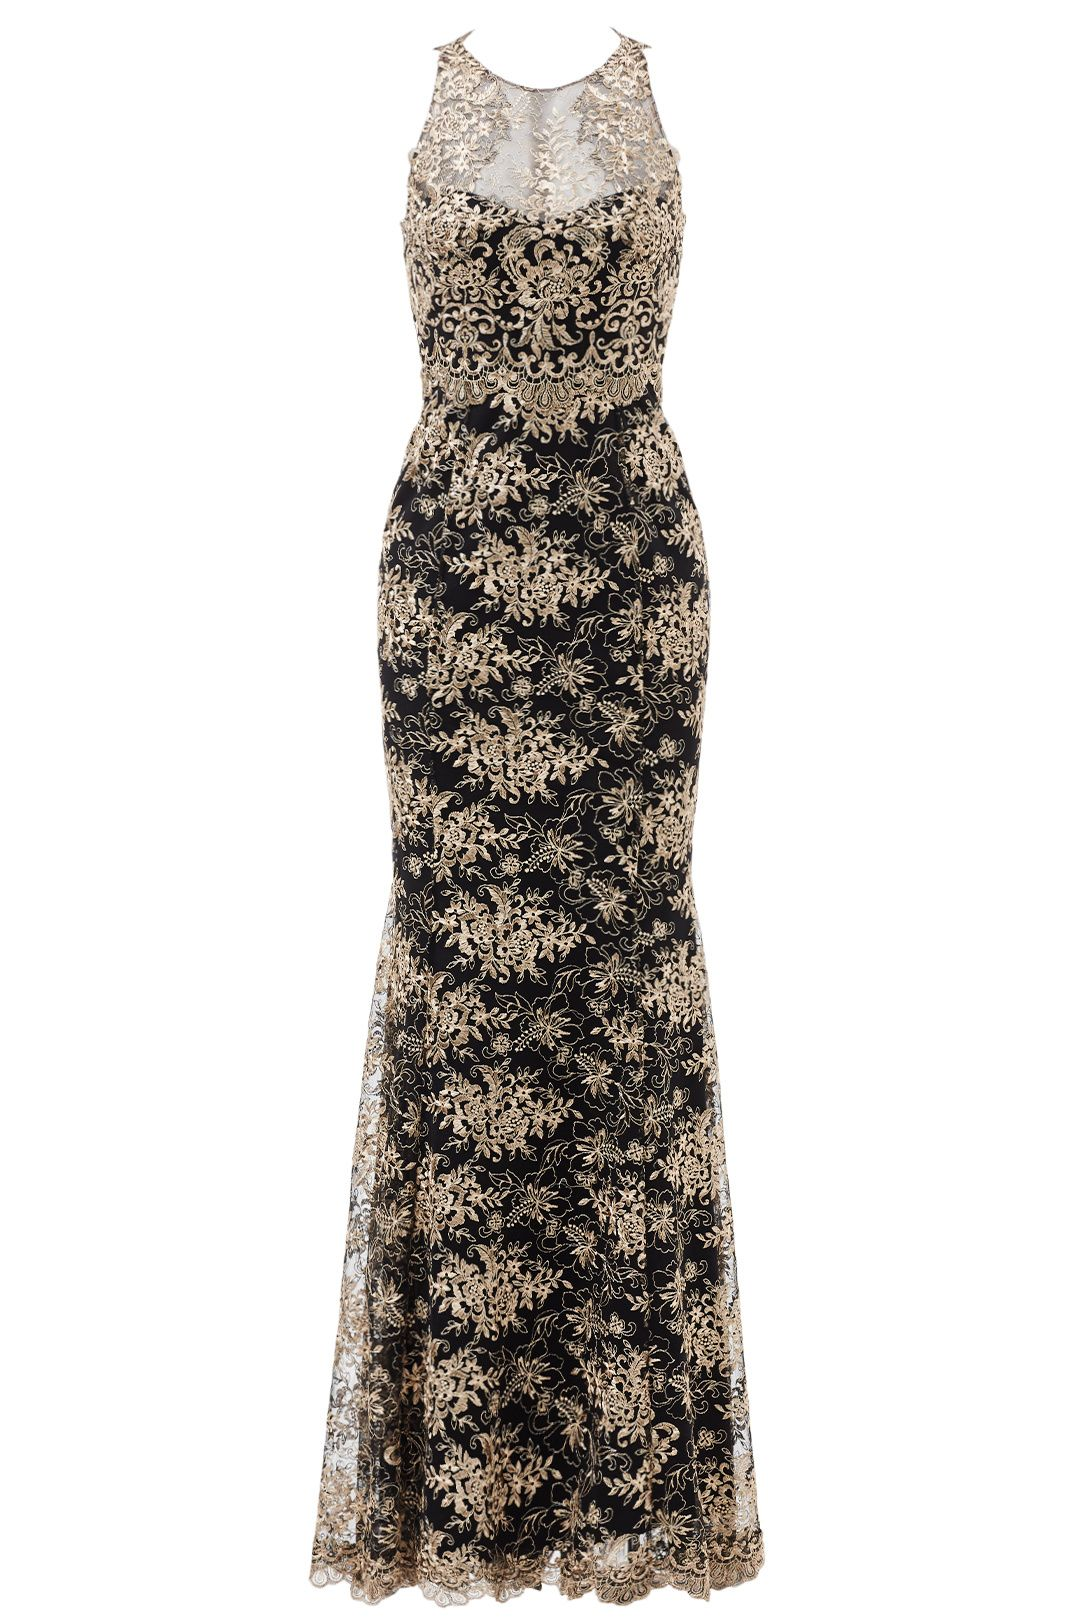 Gilded Garden Gown | Sales Online | Pinterest | Marchesa, Gowns and ...